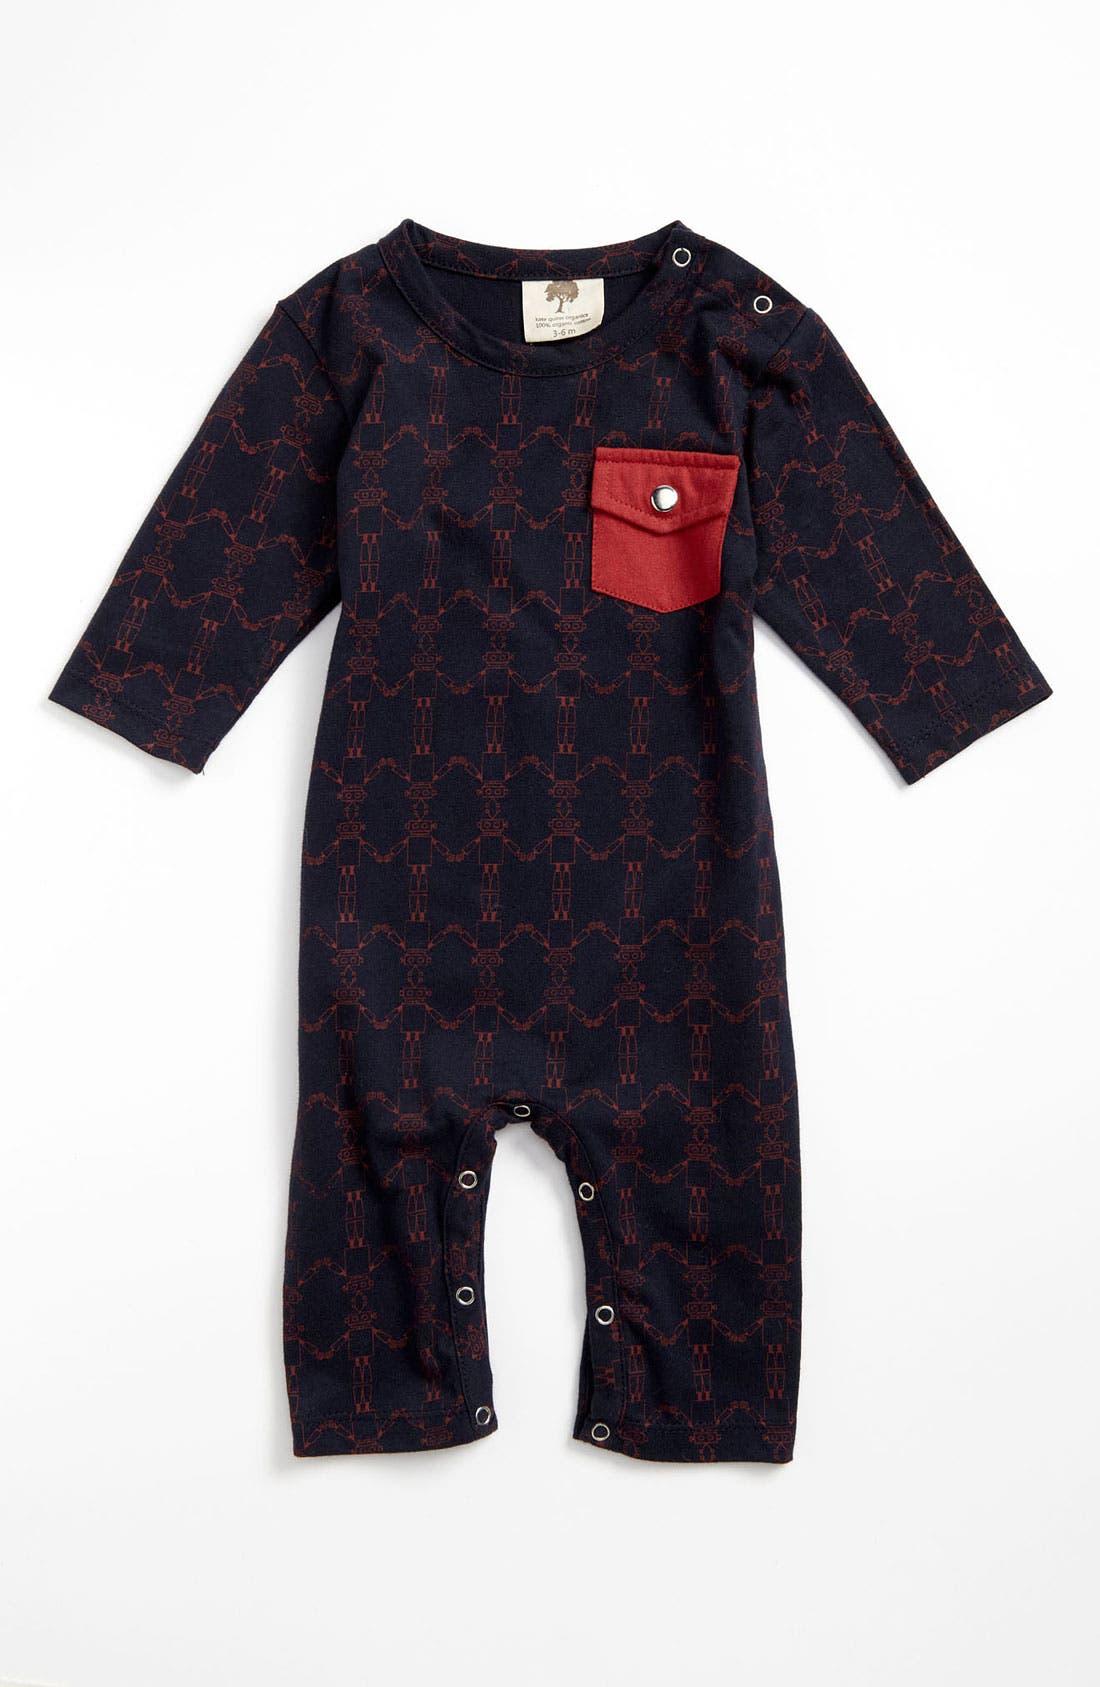 Main Image - Kate Quinn Organics Pocket Romper (Infant)